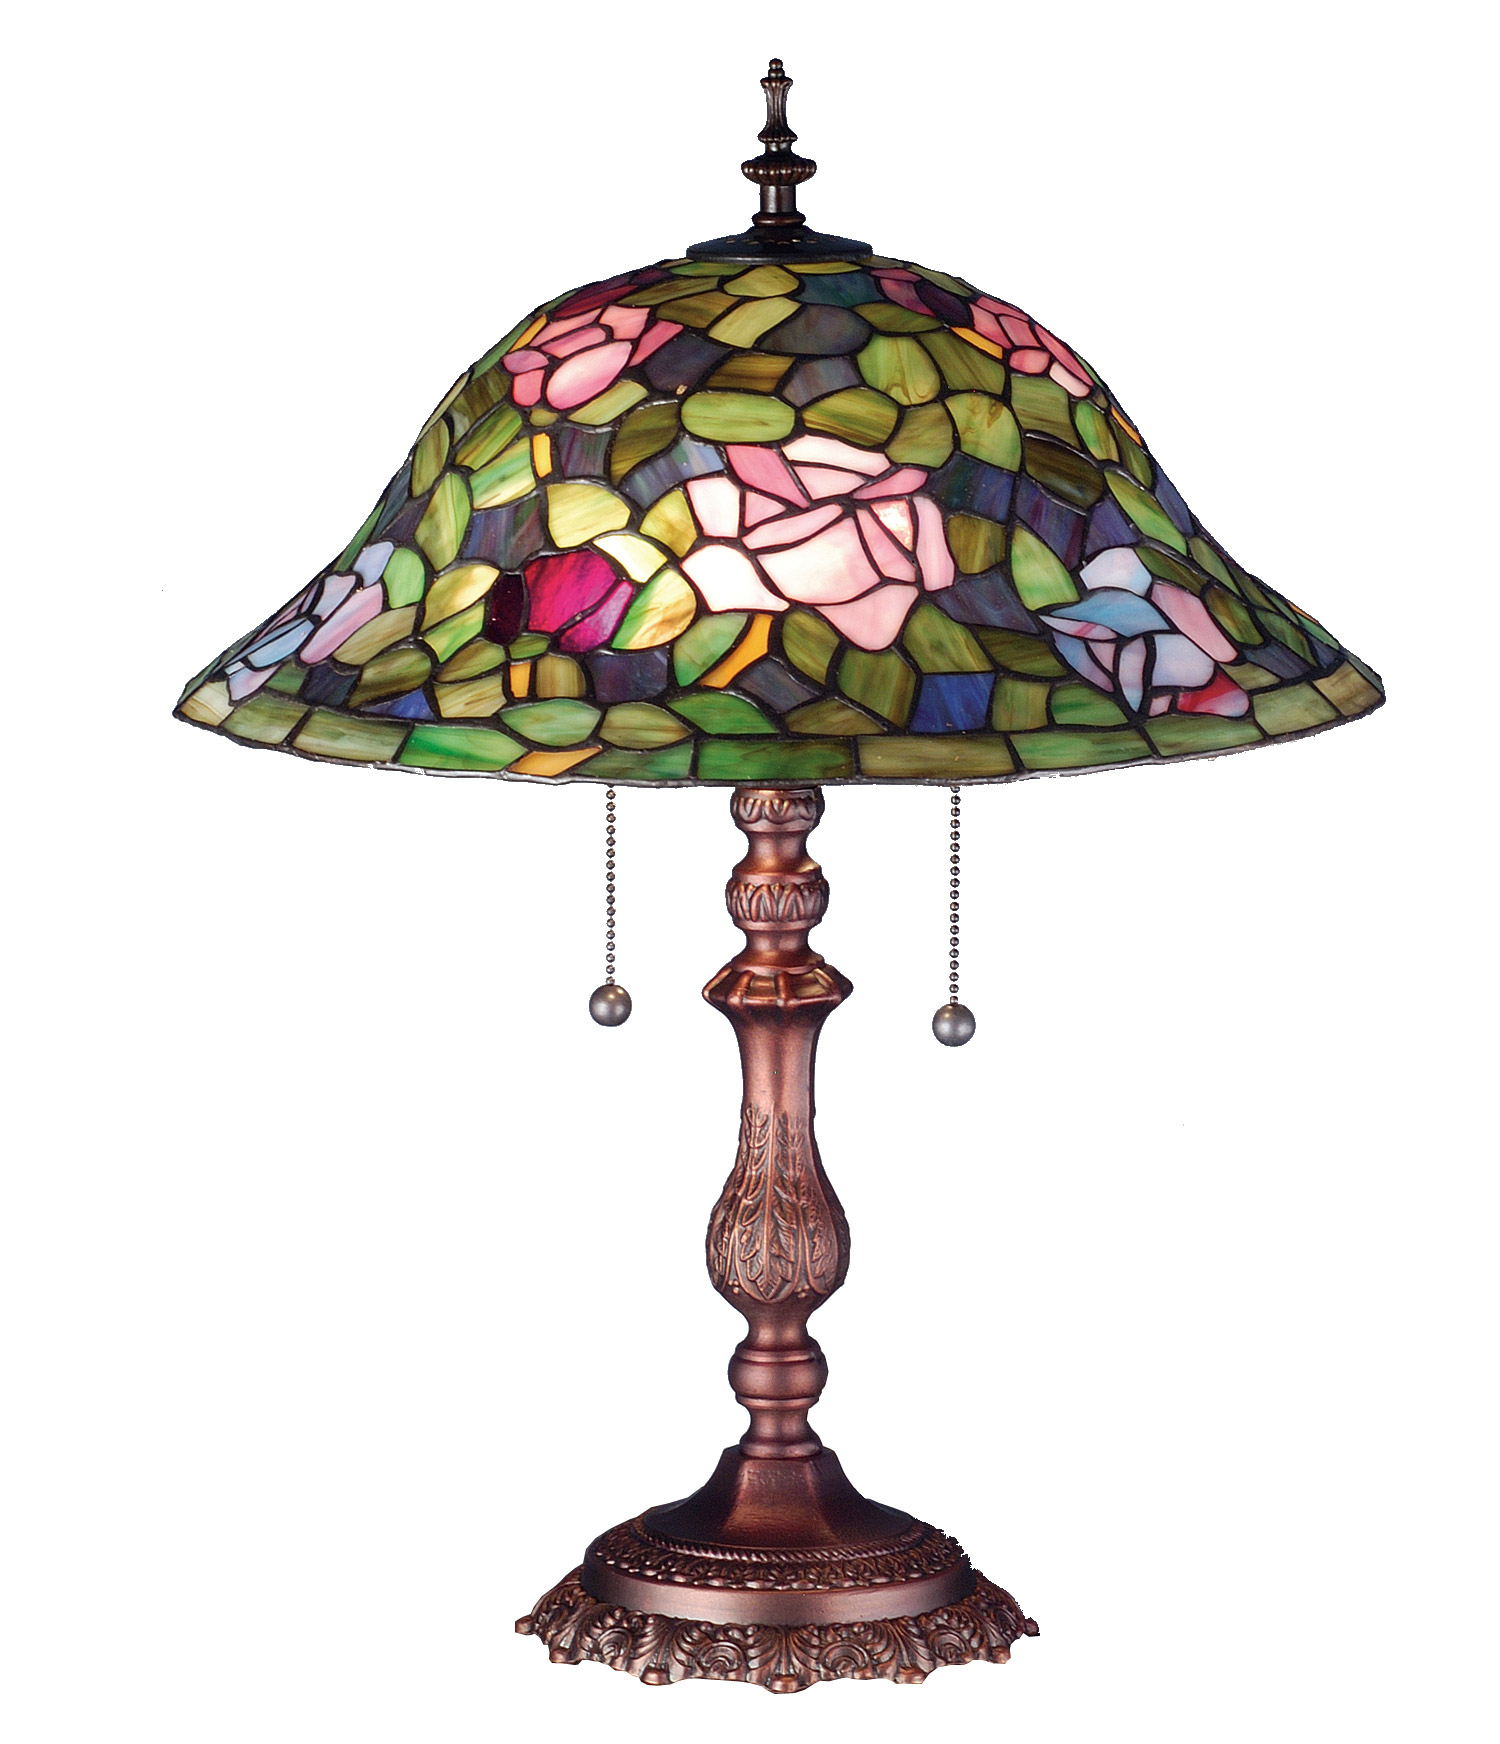 meyda 19769 tiffany rosebush table lamp. Black Bedroom Furniture Sets. Home Design Ideas